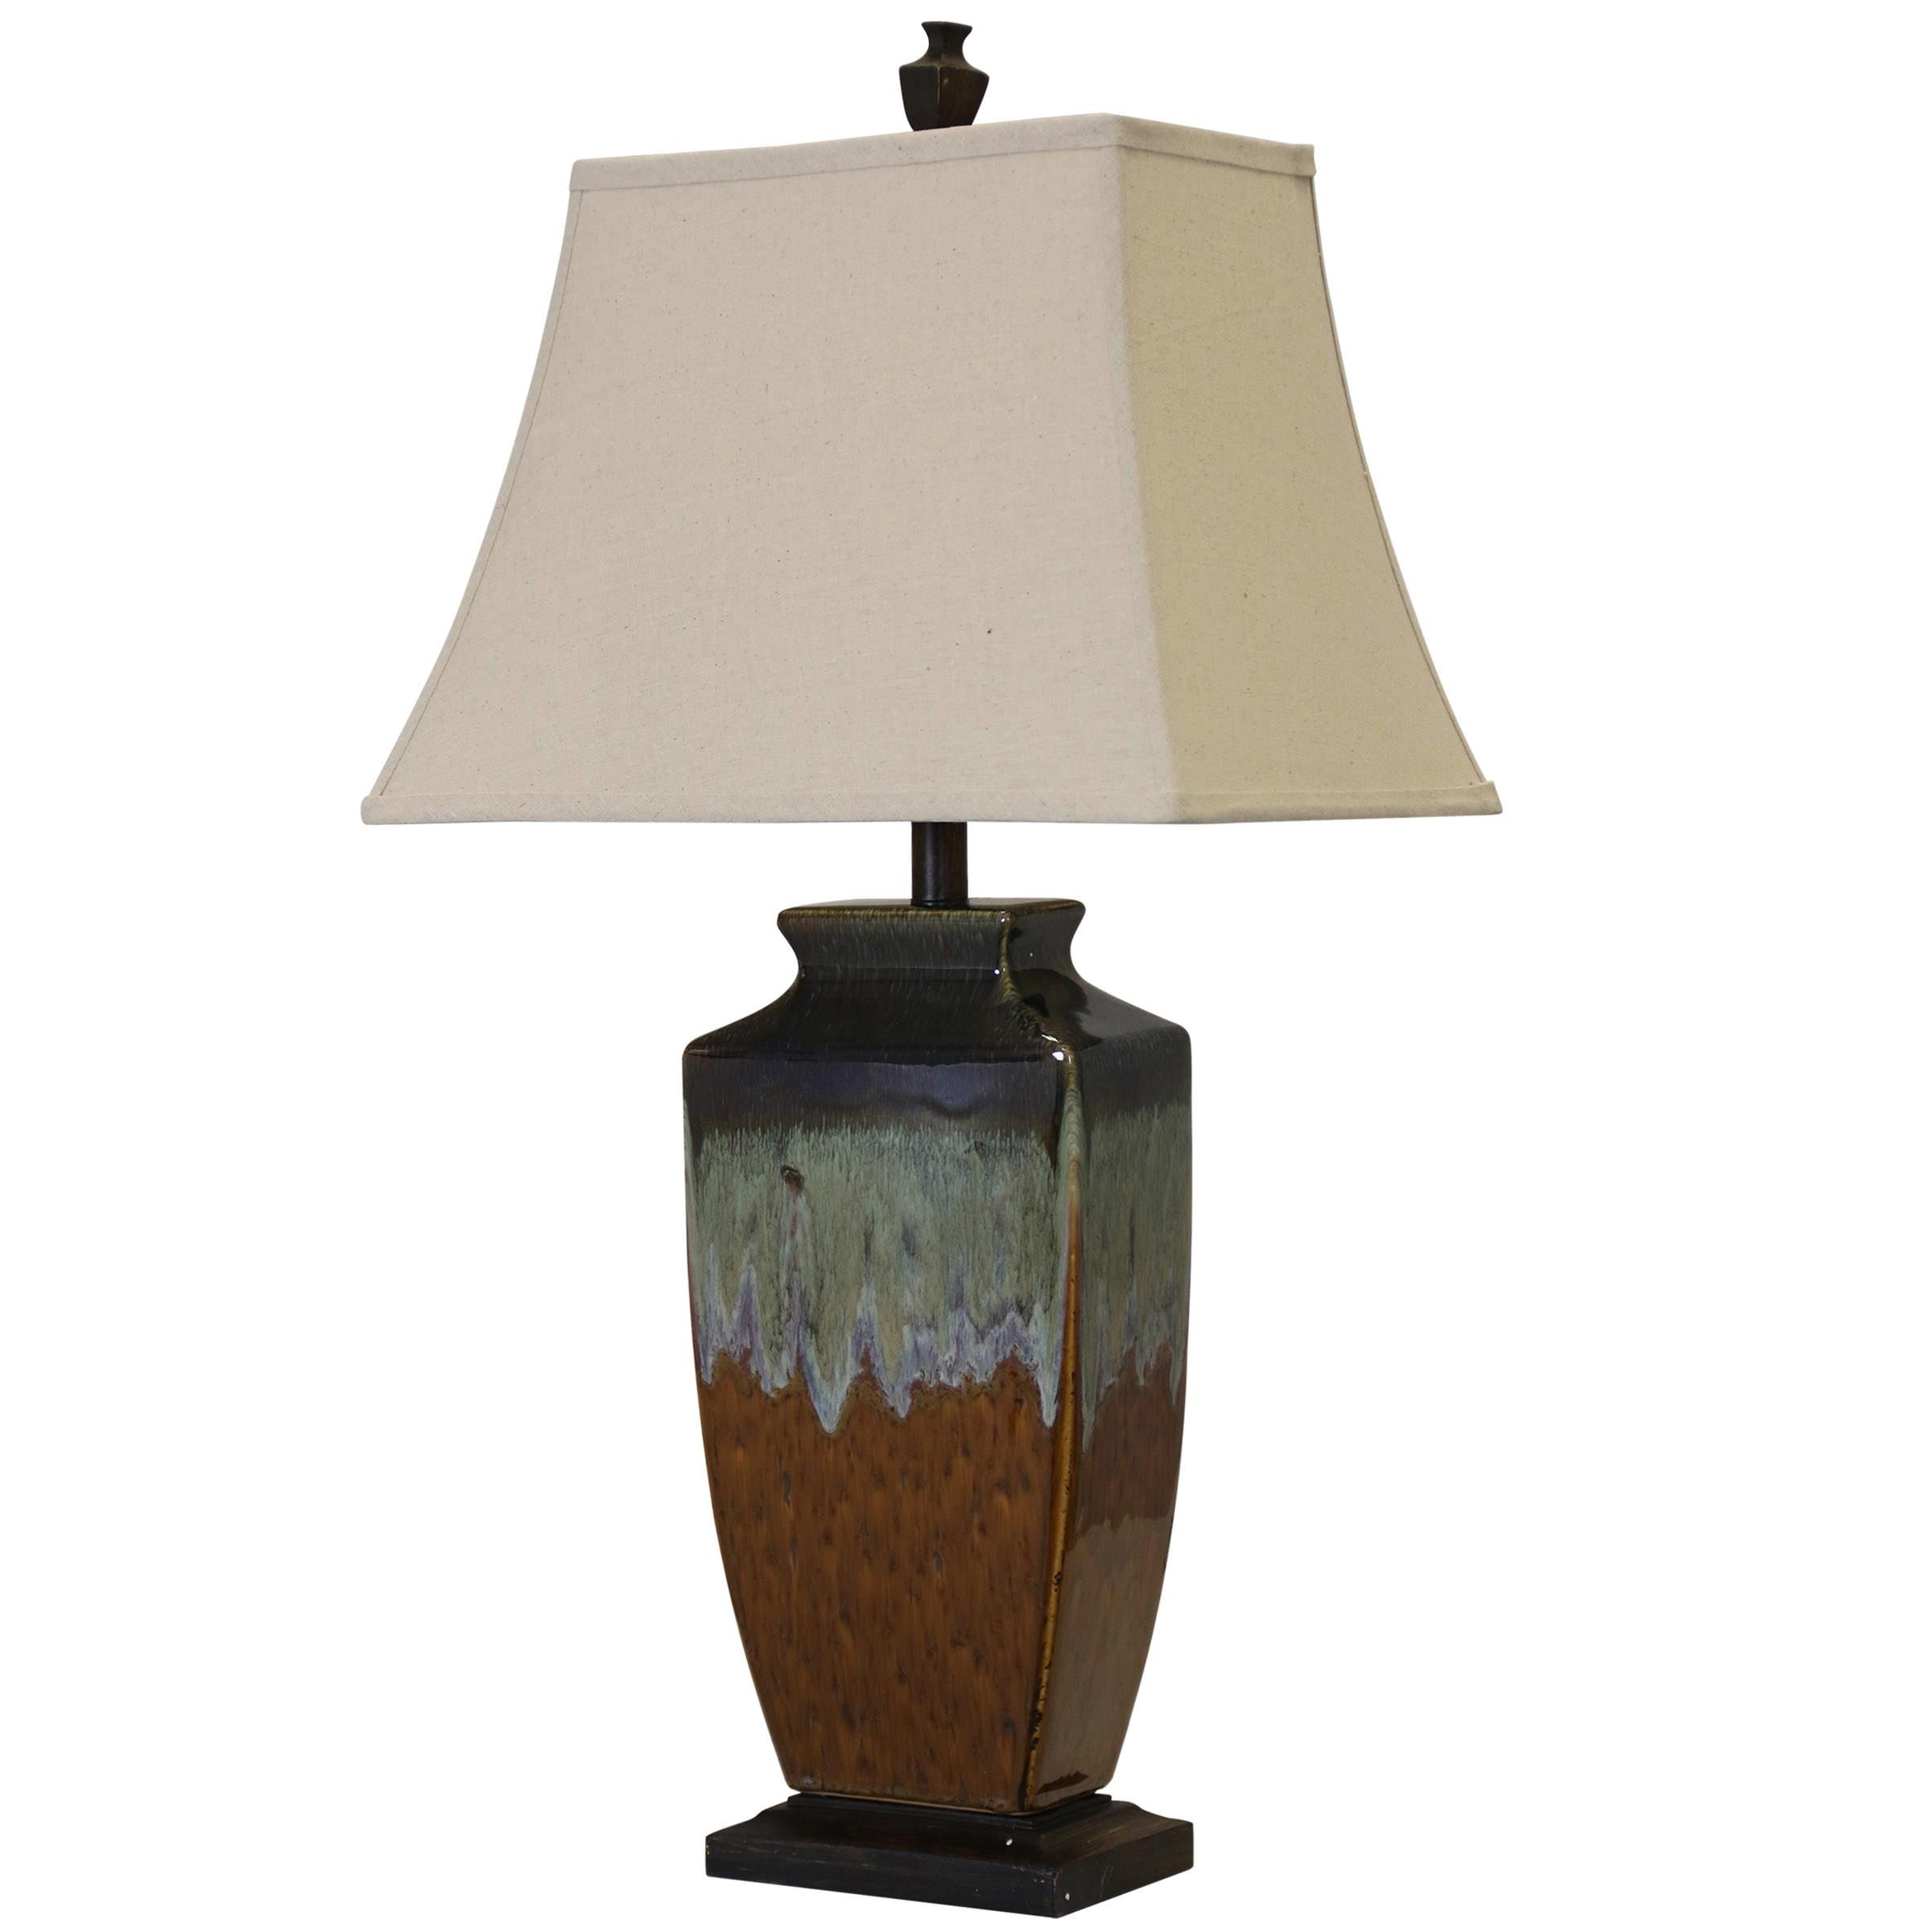 Varna Ceramic Table Lamp Brown And Turquoise Glaze Finish Cream